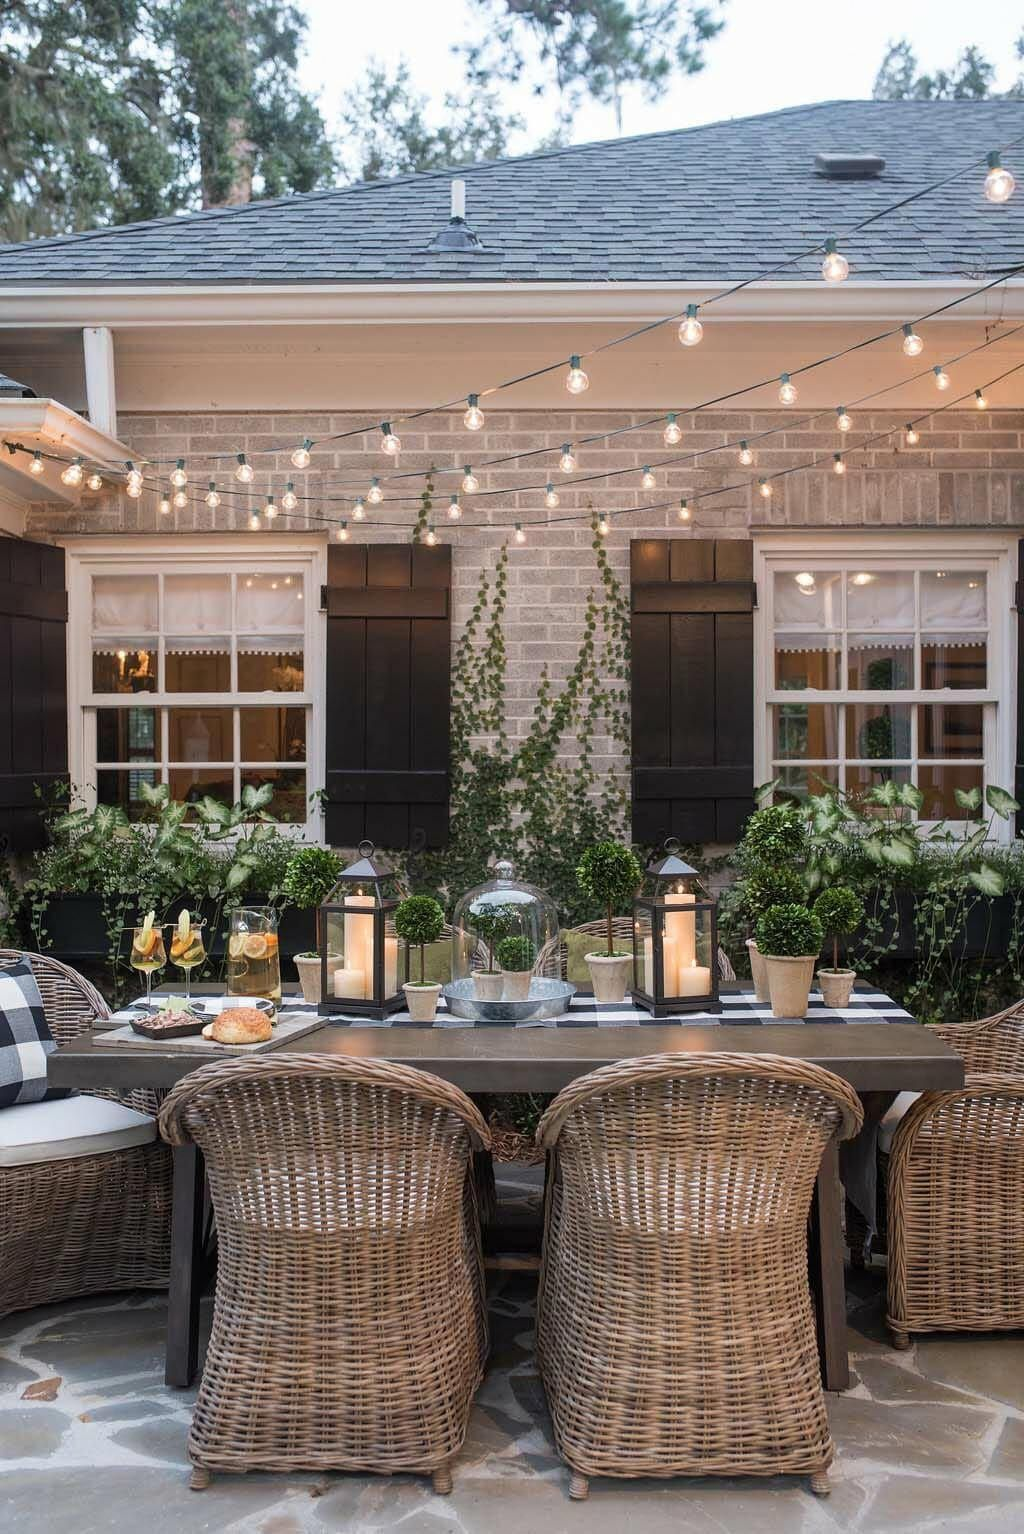 28 delightful backyard design ideas for summertime inspiration rh pinterest es